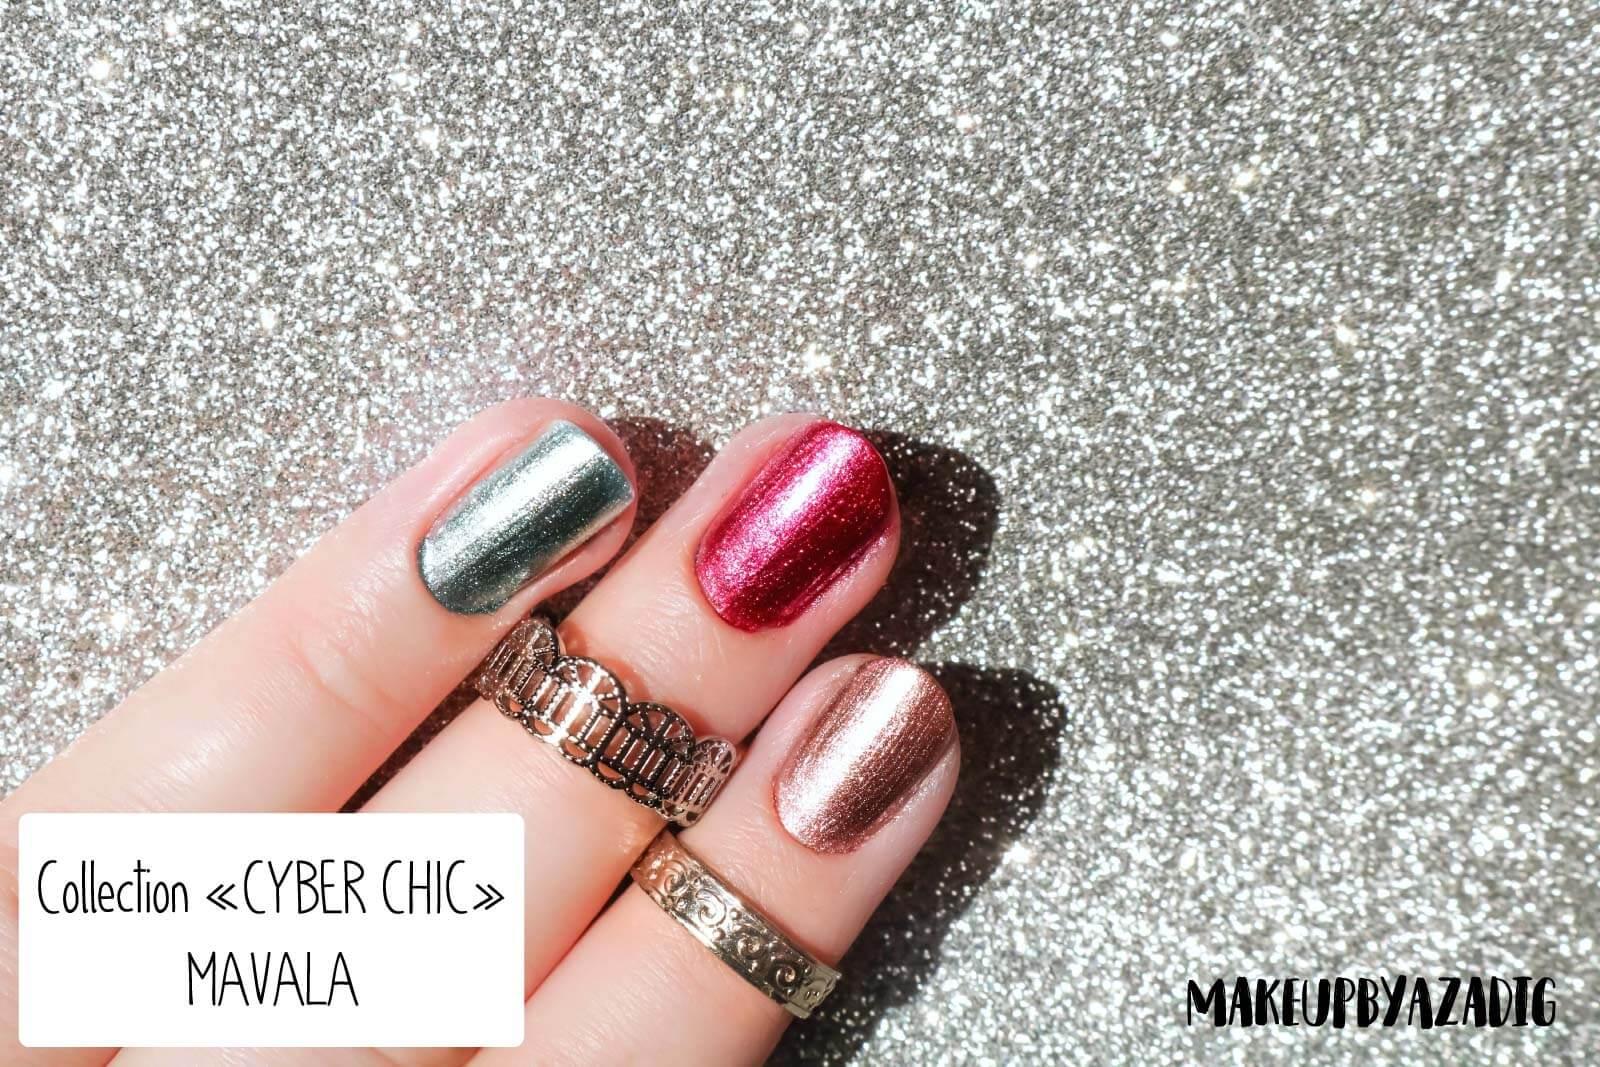 revue-collection-vernis-nails-cyber-chic-fetes-noel-metallique-gold-silver-makeupbyazadig-swatch-avis-prix-swatches